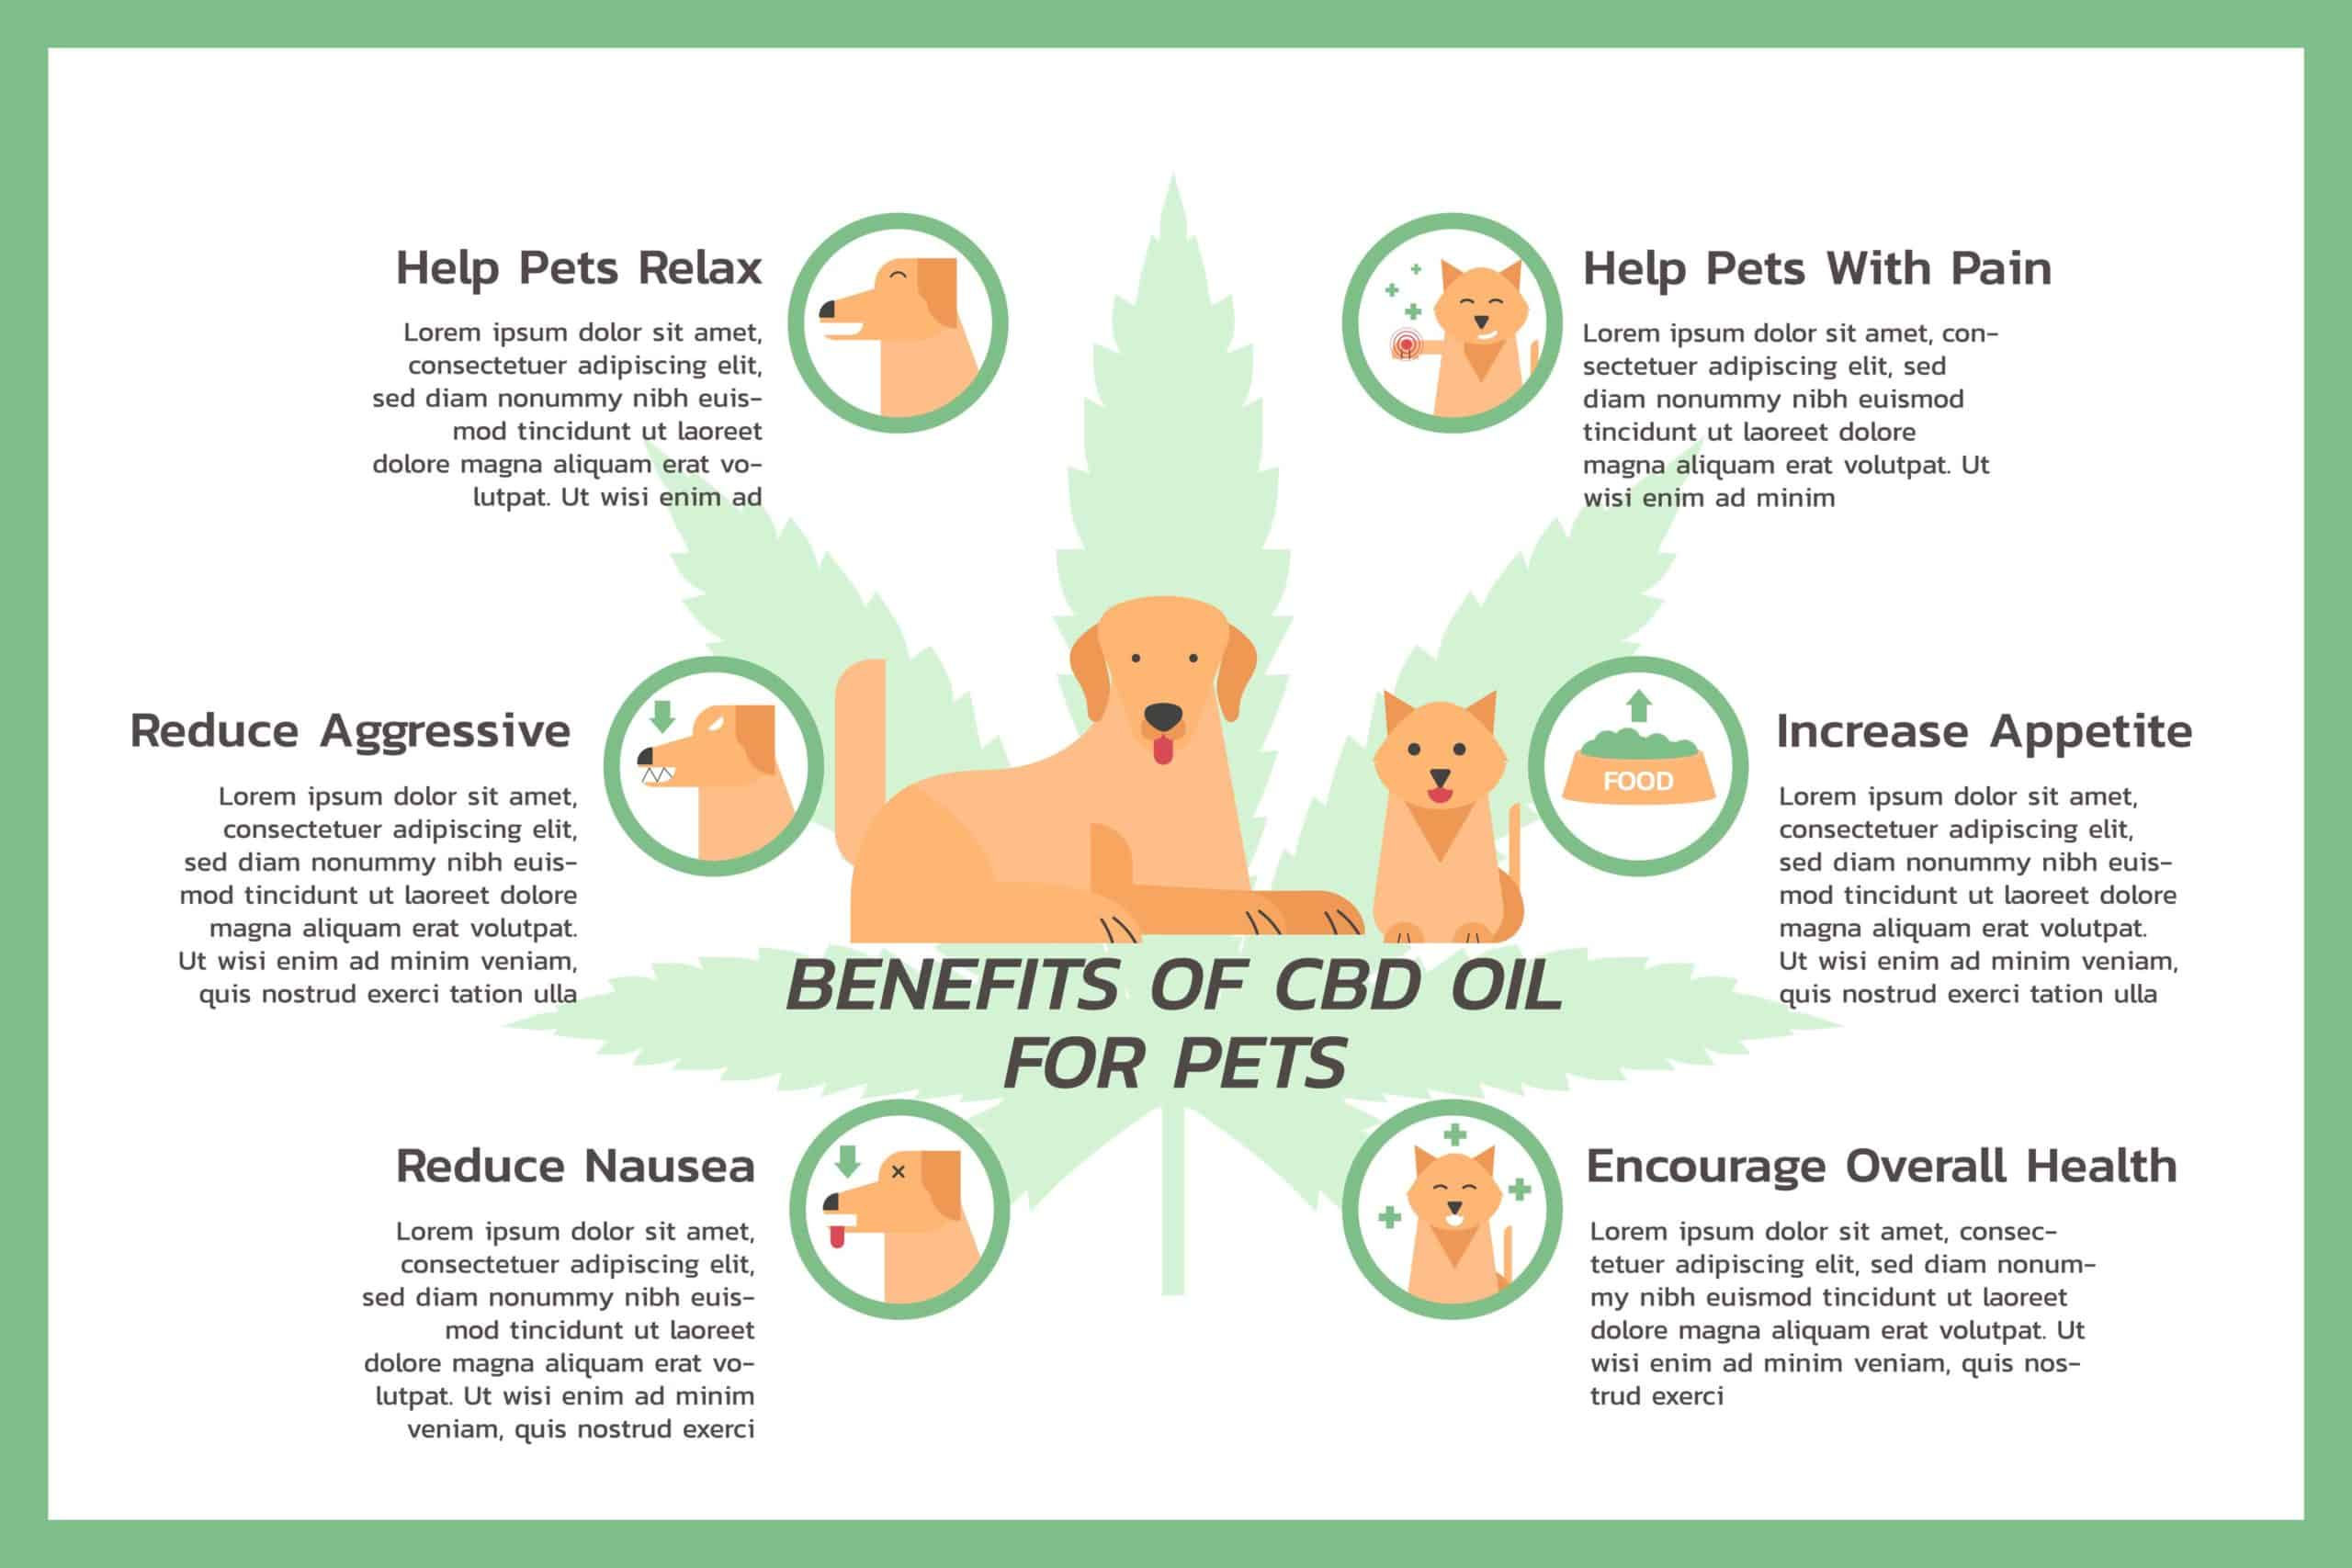 CBD oil benefits graphic details ways CBD helps dogs.